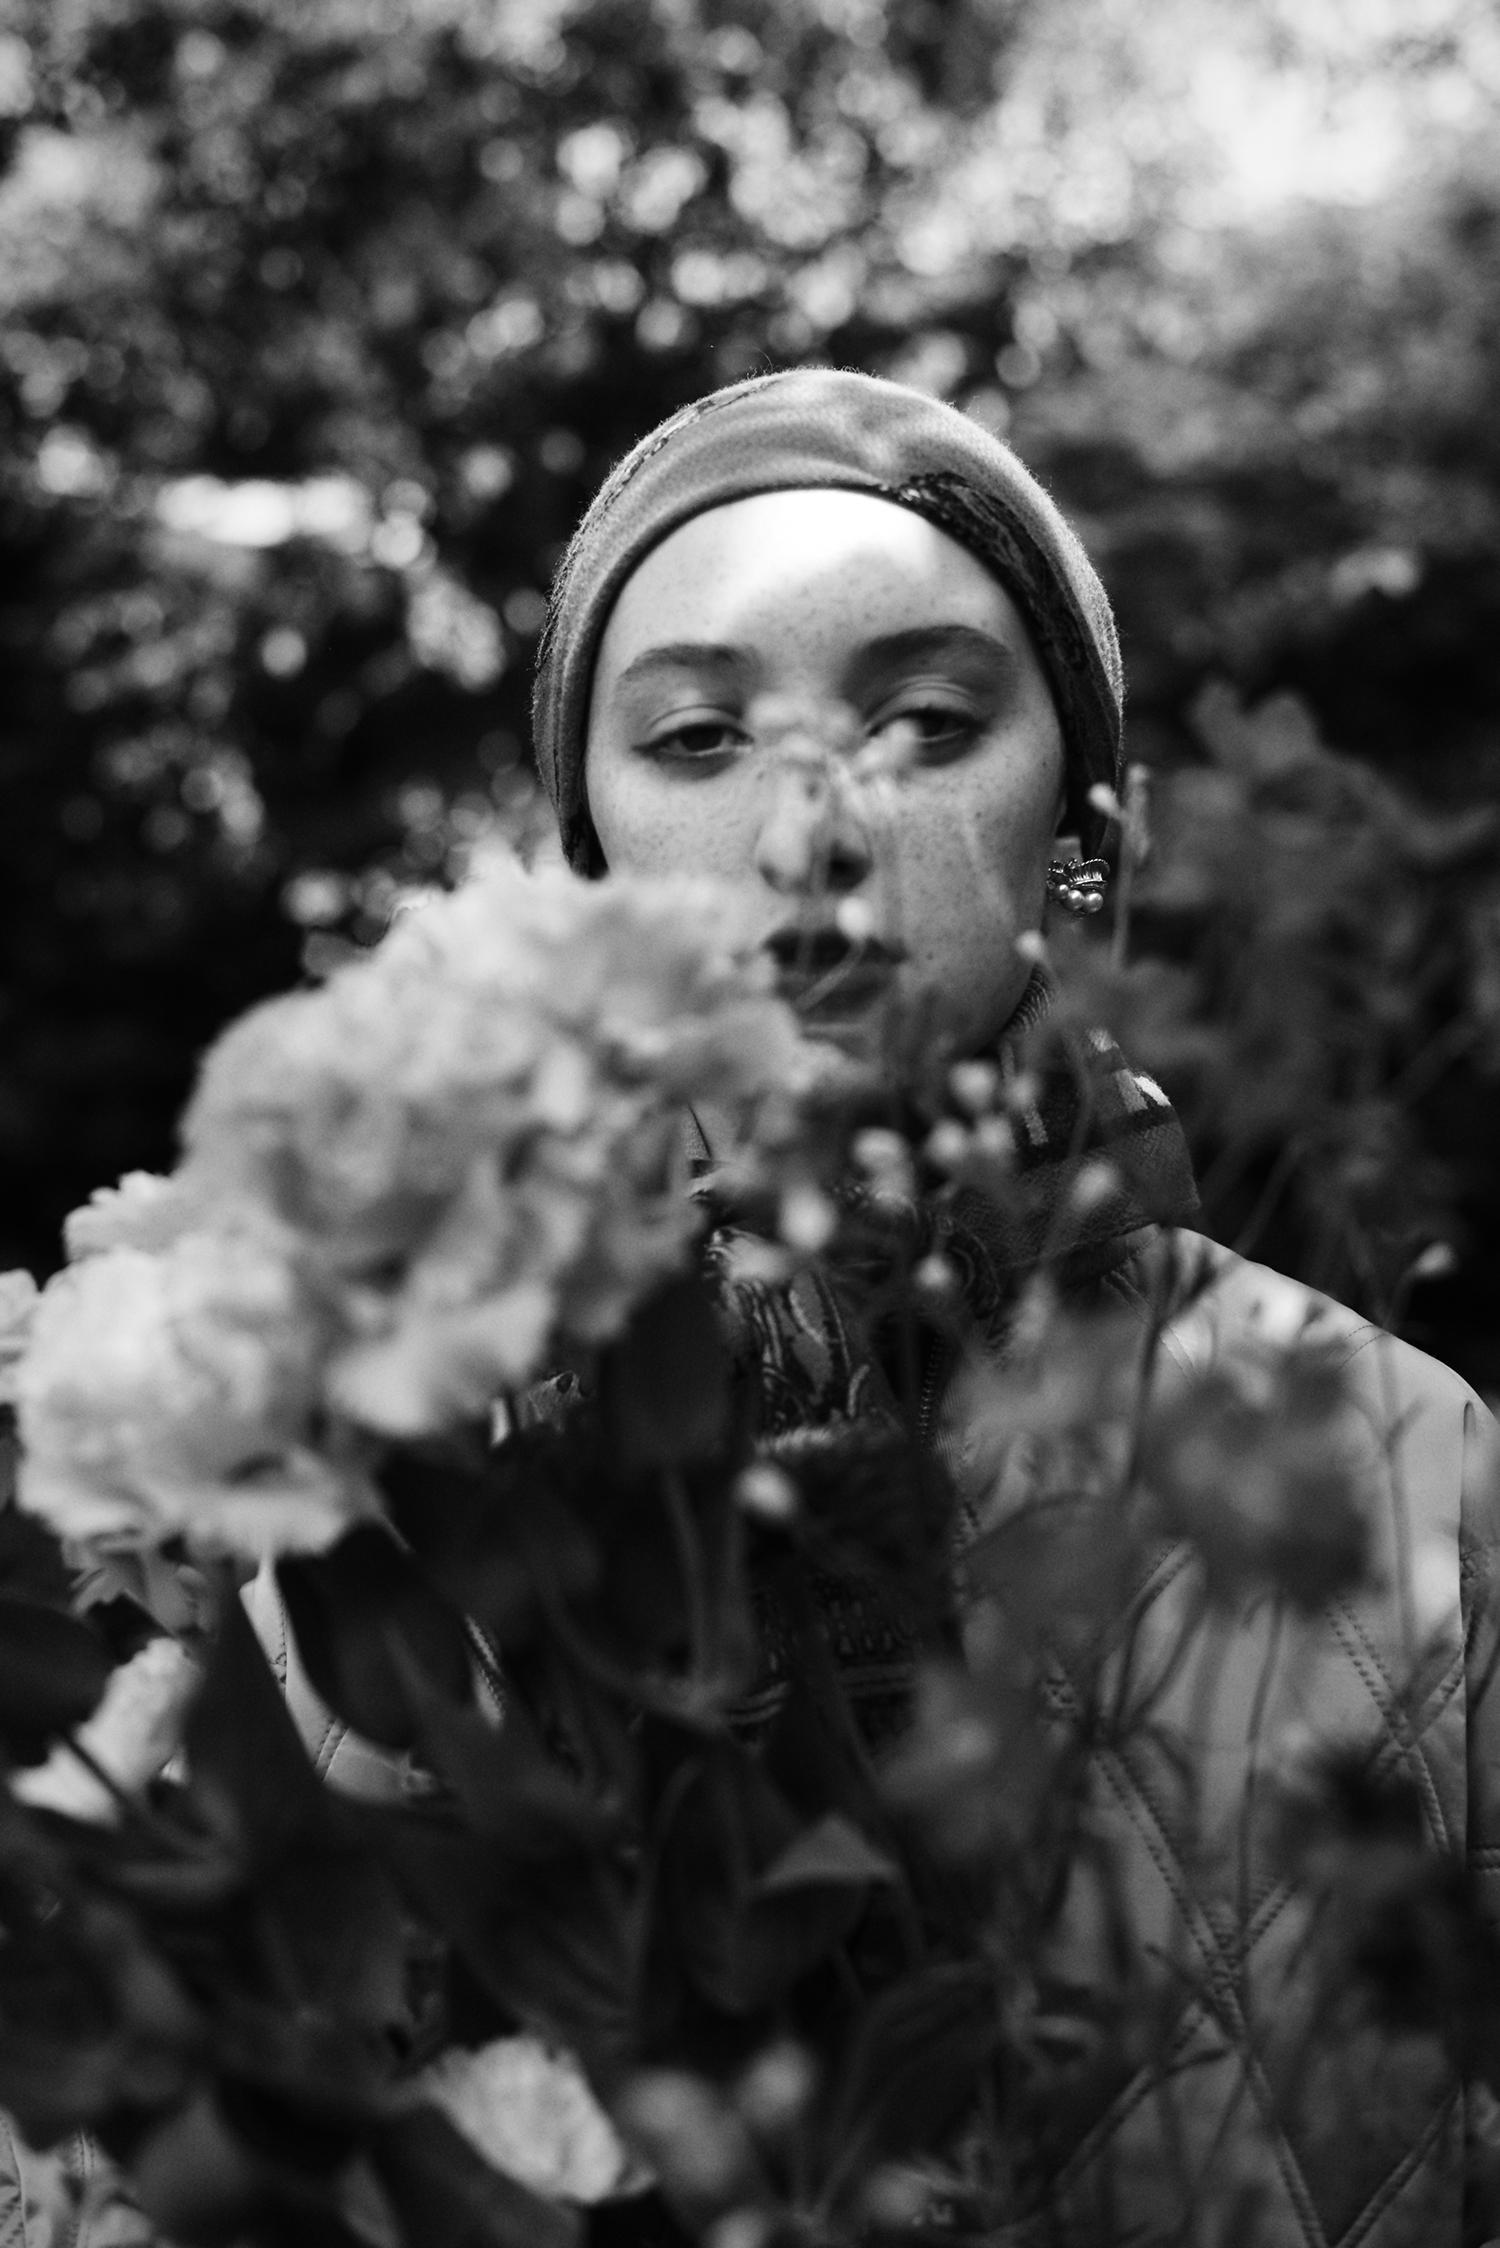 【WOMEN'S 2019AW】Faded Garden アイテム